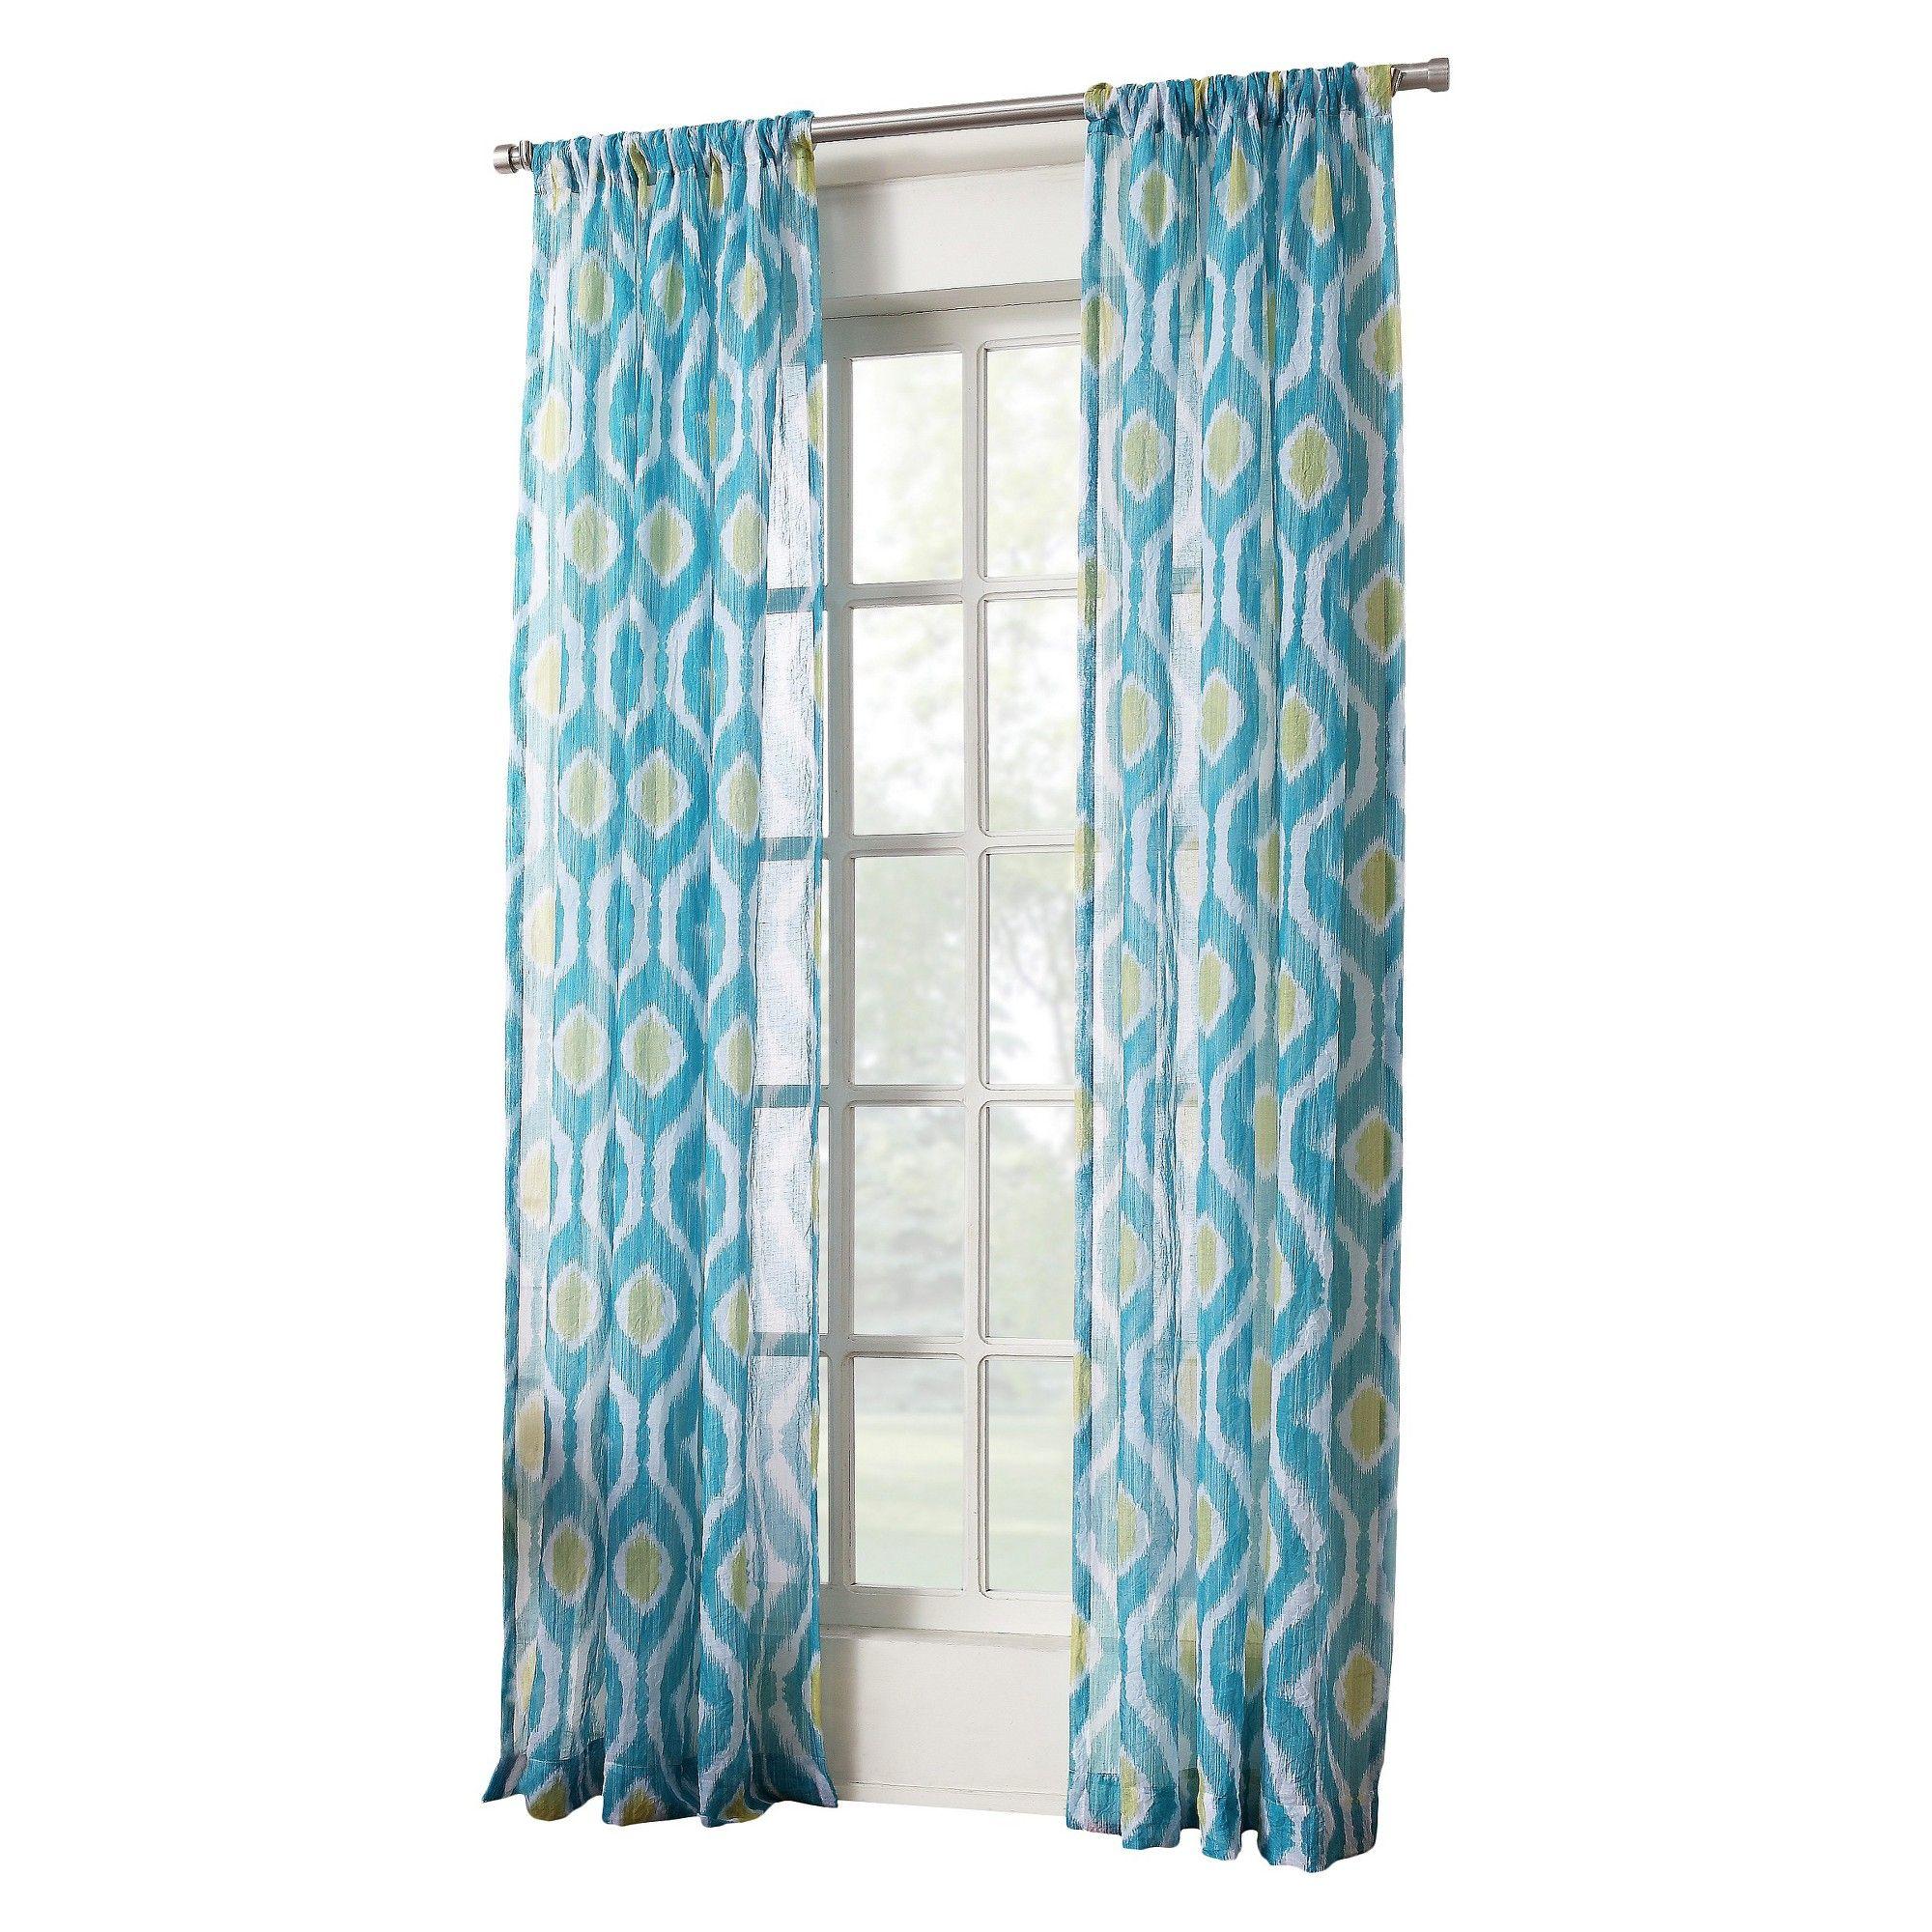 Winslow Ikat Print Crushed Sheer Voile Rod Pocket Curtain Panel